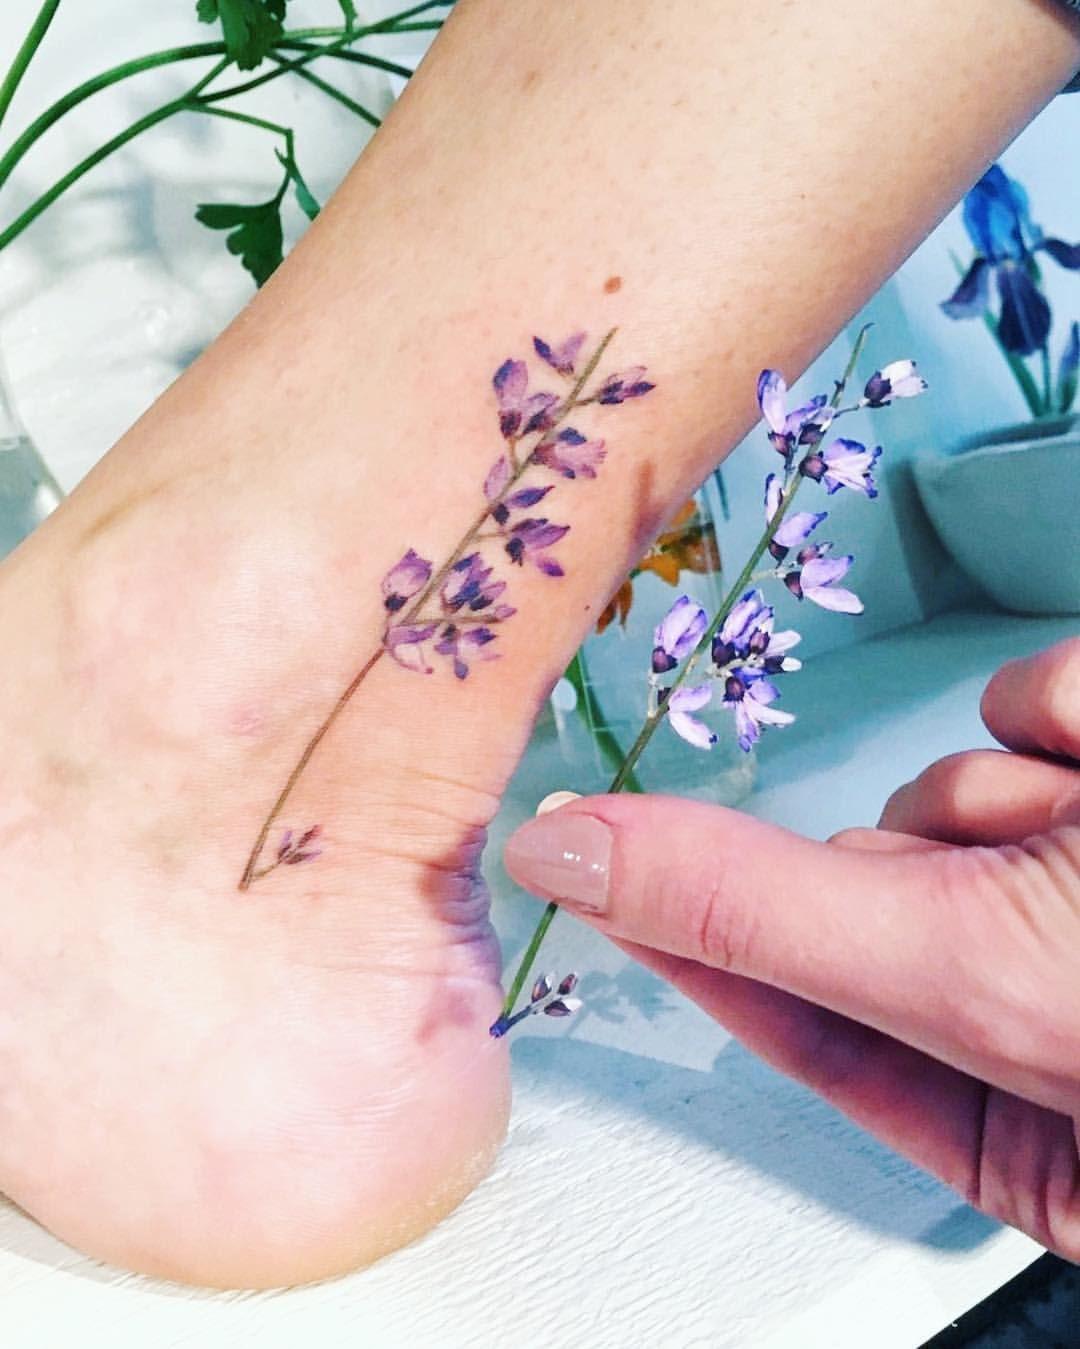 Tattoo Purple Lavanda Art Flower Realistic Flower Tattoo Simple Flower Tattoo Ankle Tattoo Designs